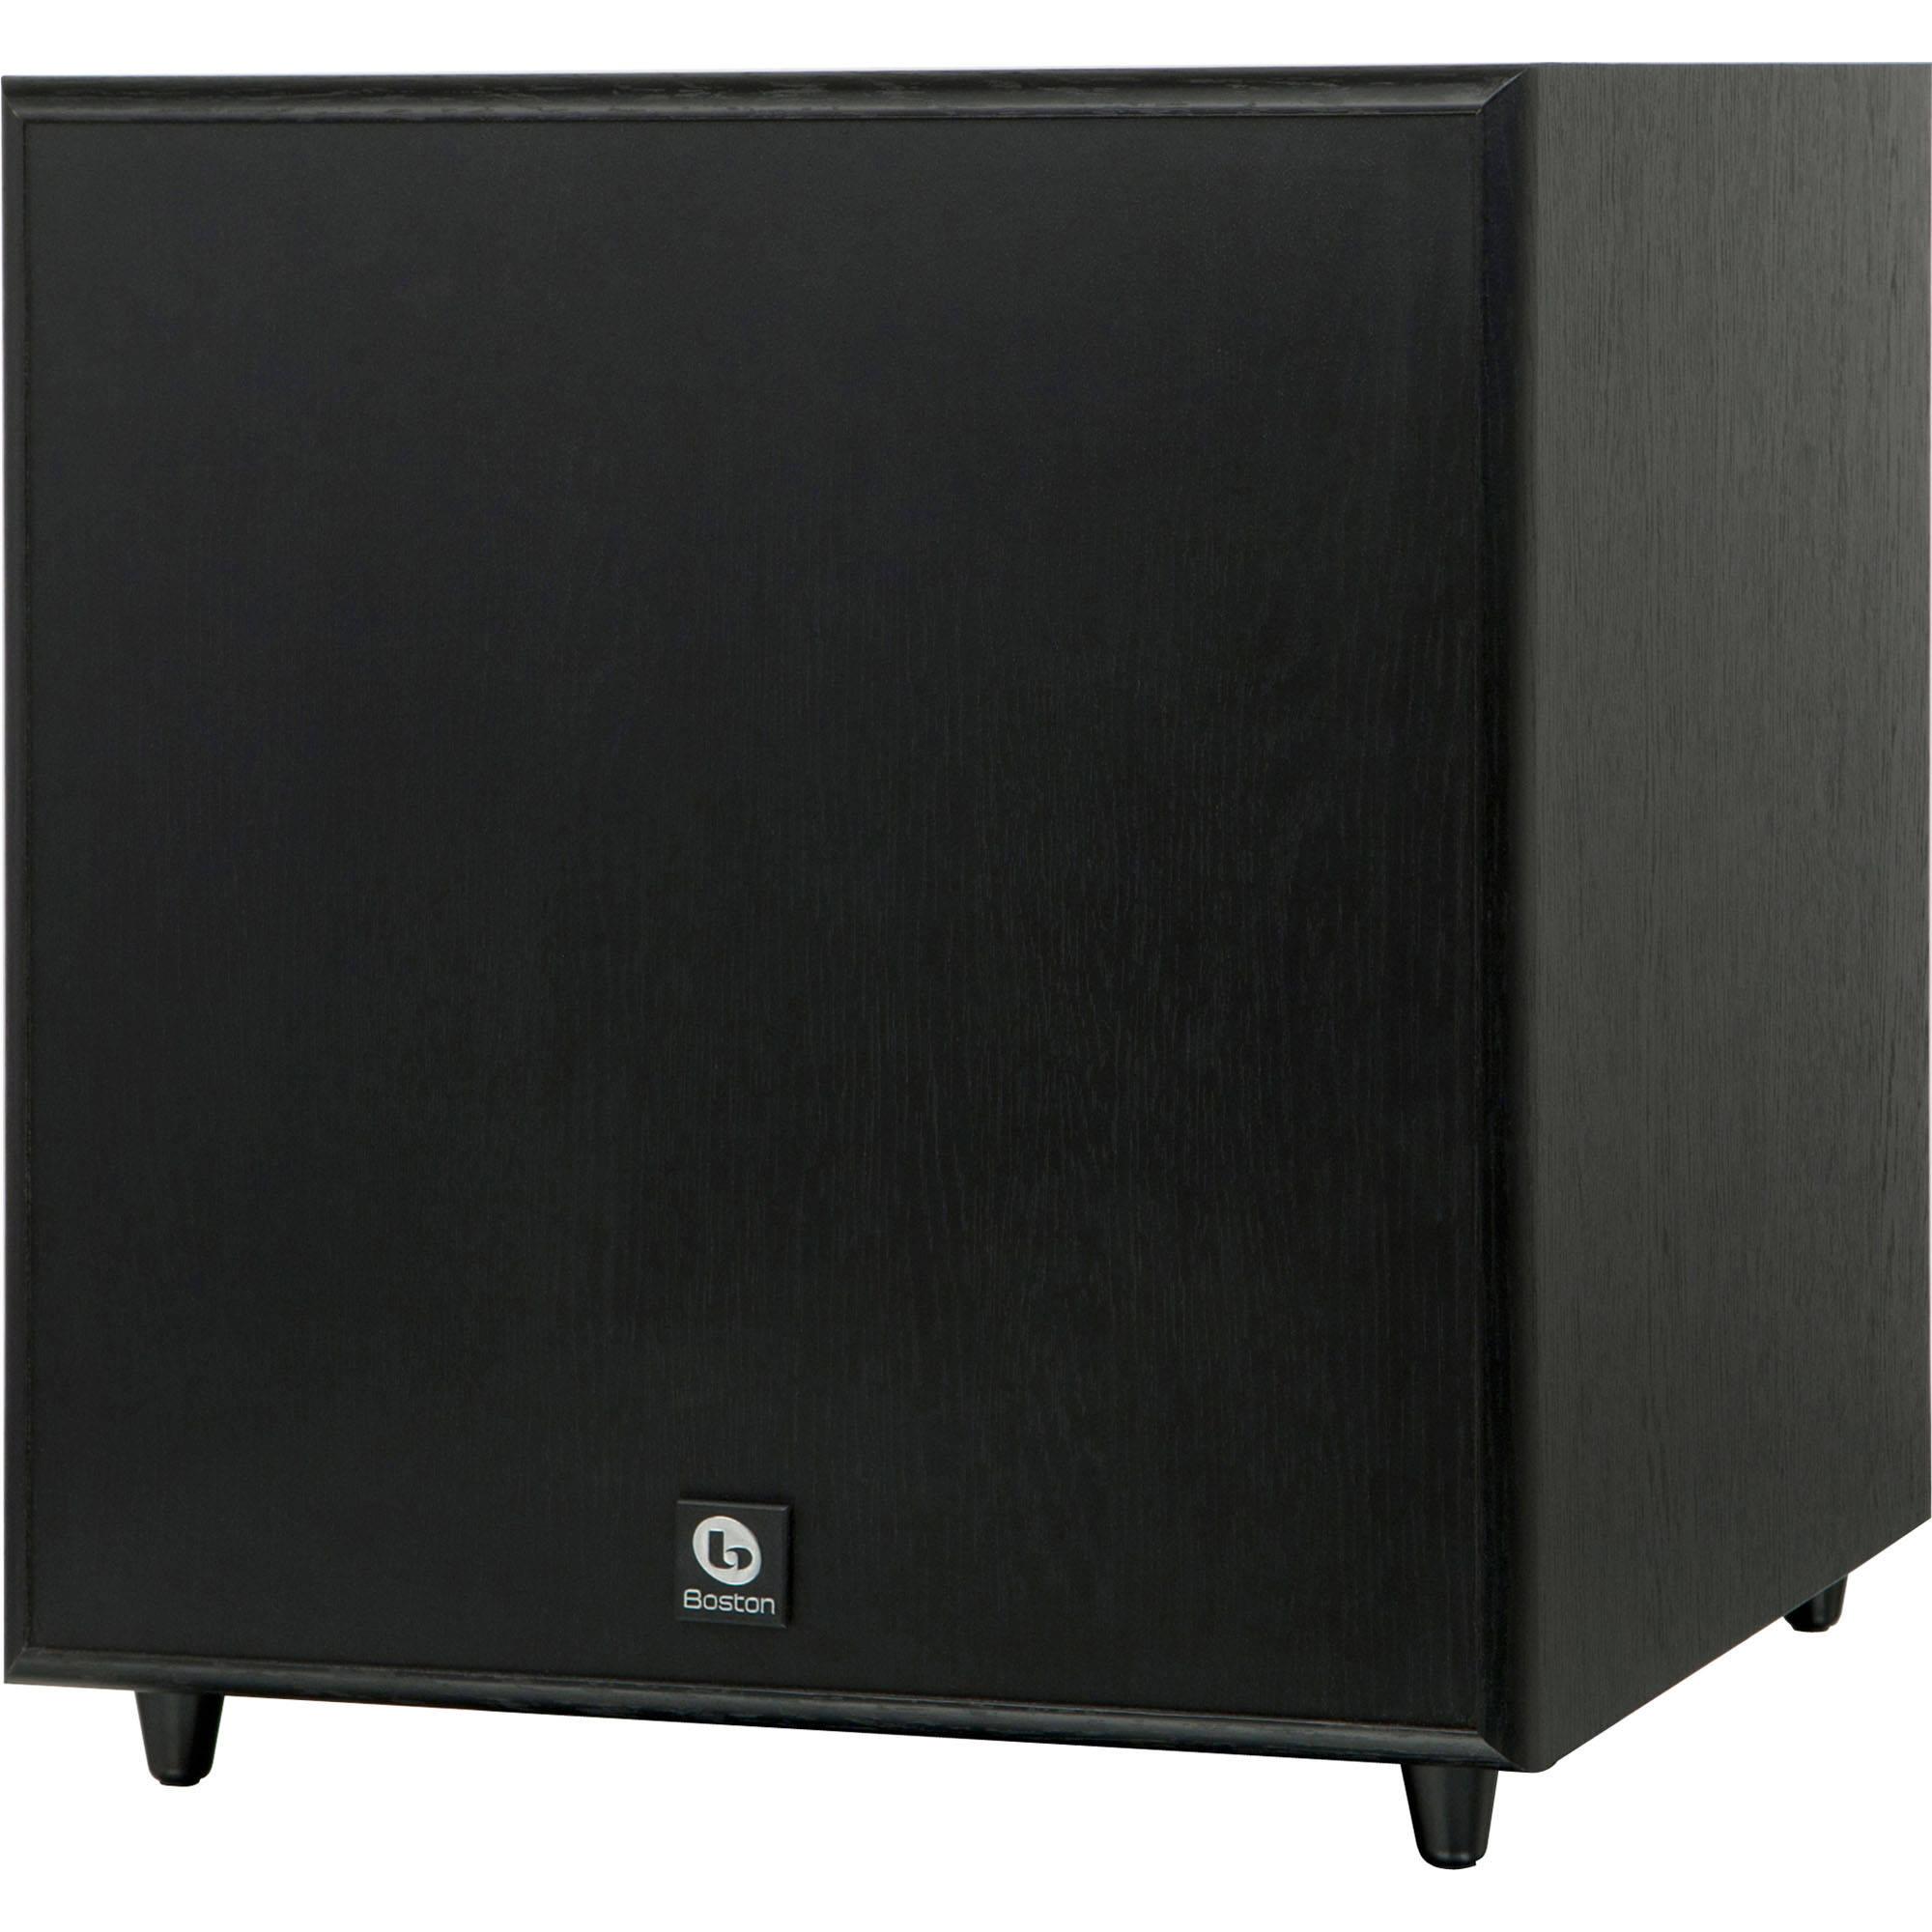 boston acoustics classic series sub10 ii cssub10iib 01201 b h. Black Bedroom Furniture Sets. Home Design Ideas